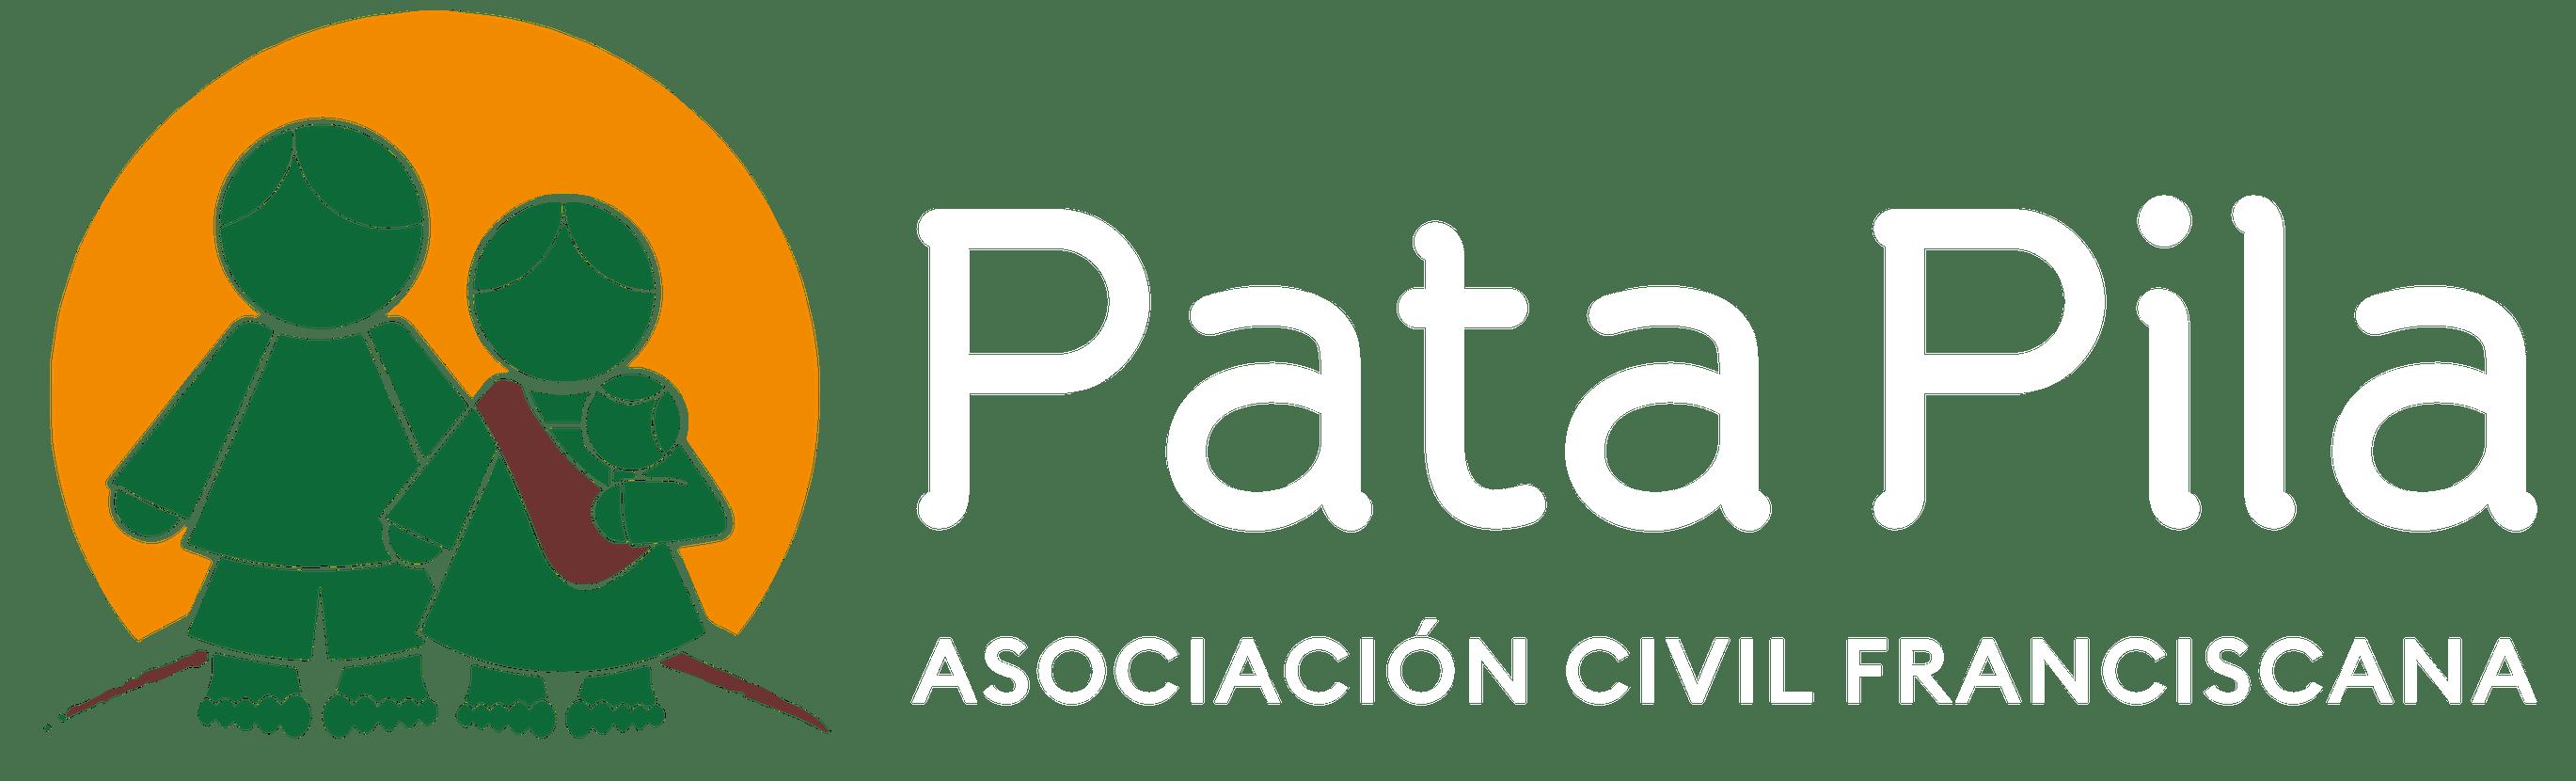 Pata Pila